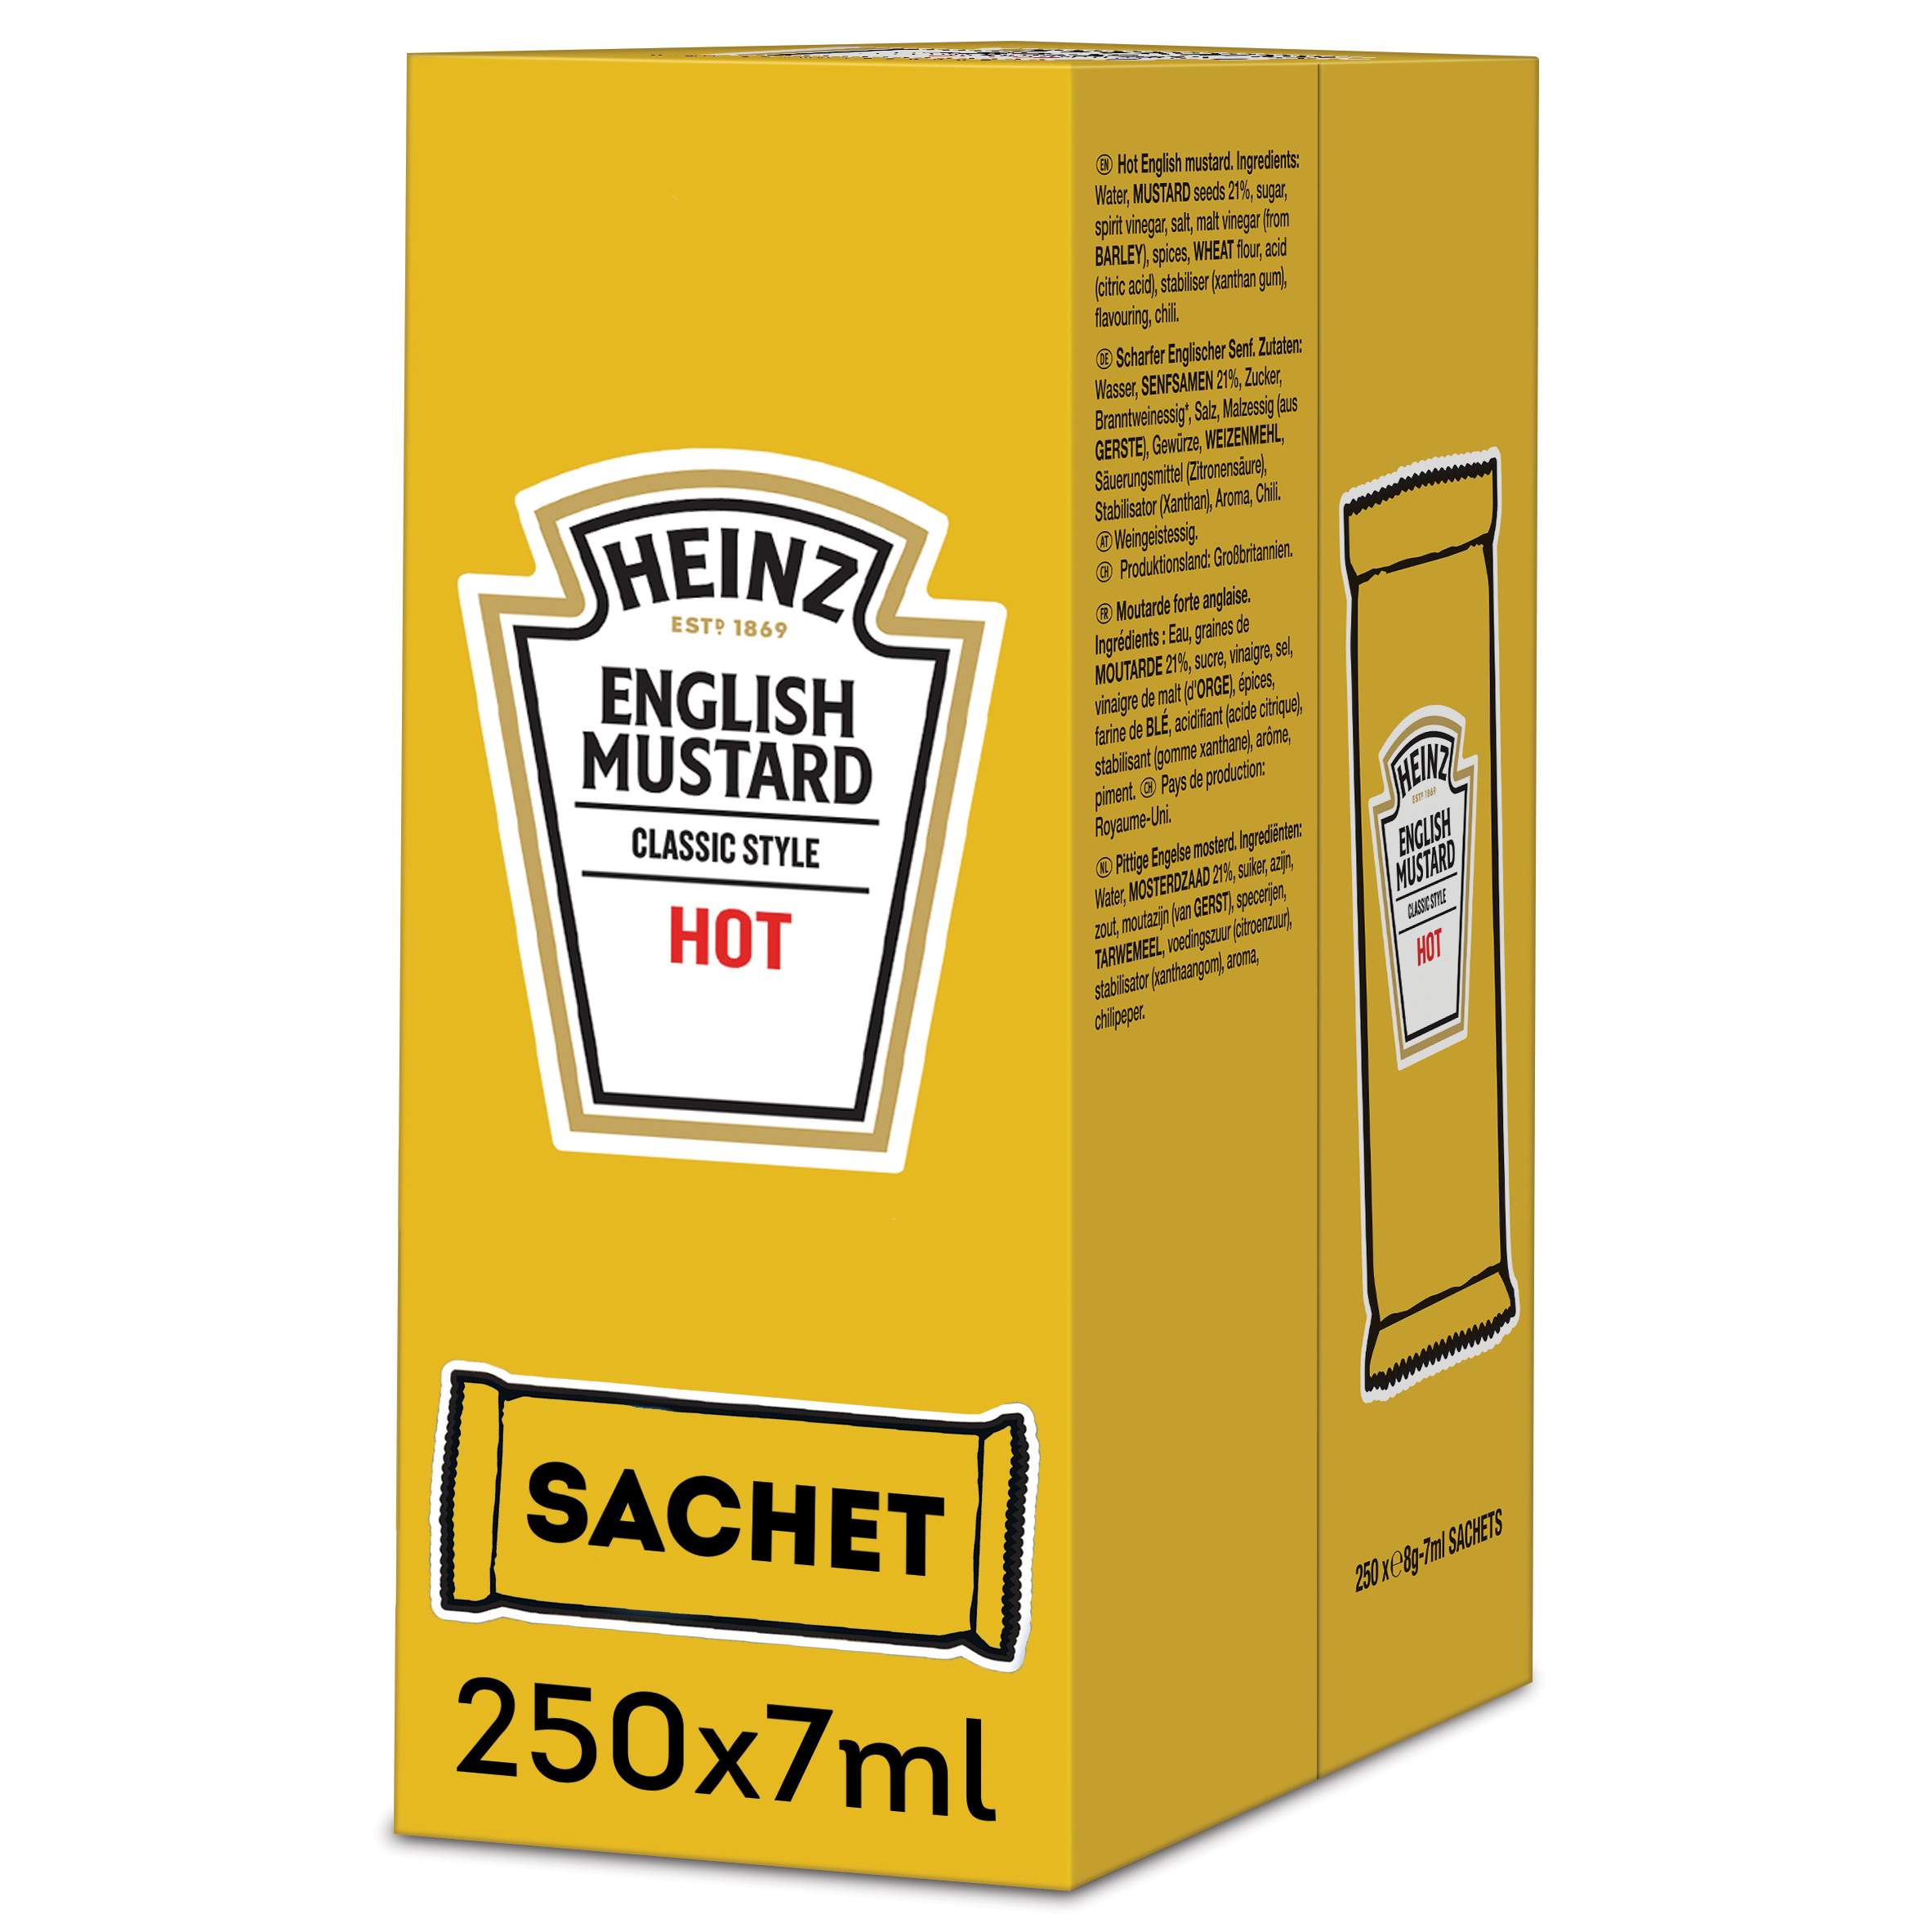 Heinz English Mustard Hot 7ml Sachet